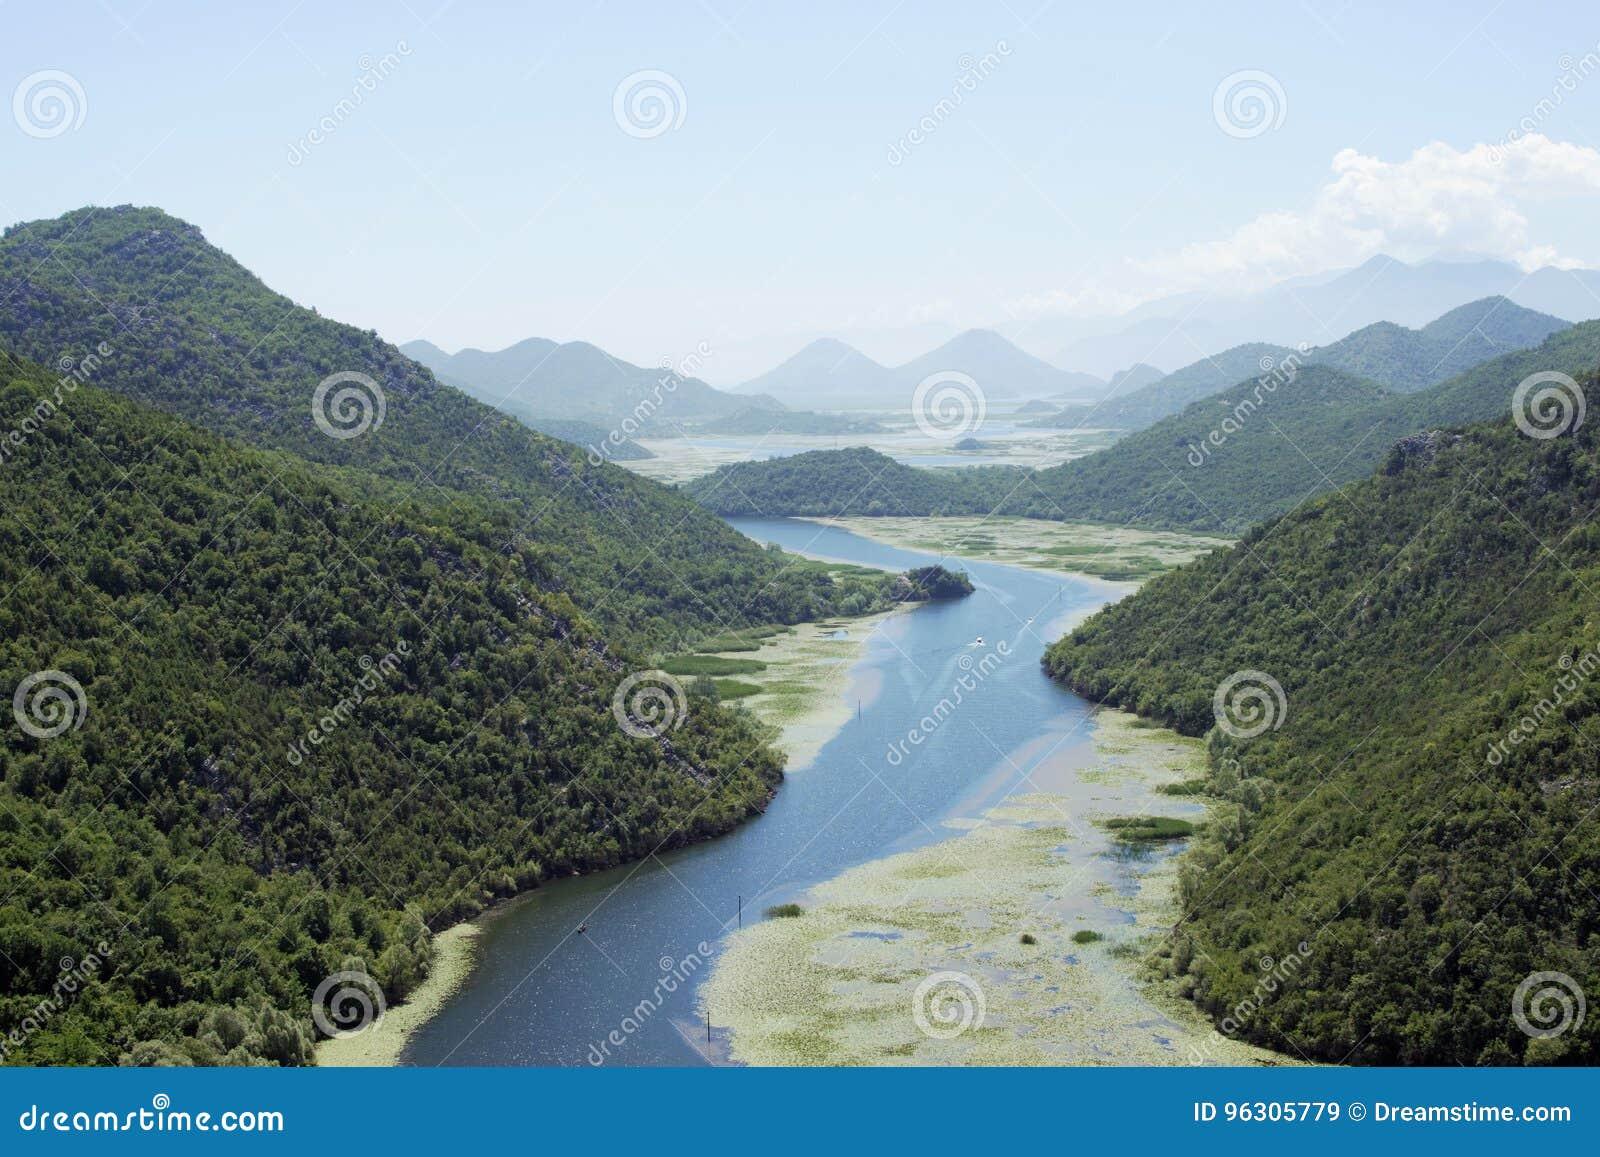 Rijeka crnojevica Montenegro River and Mountains